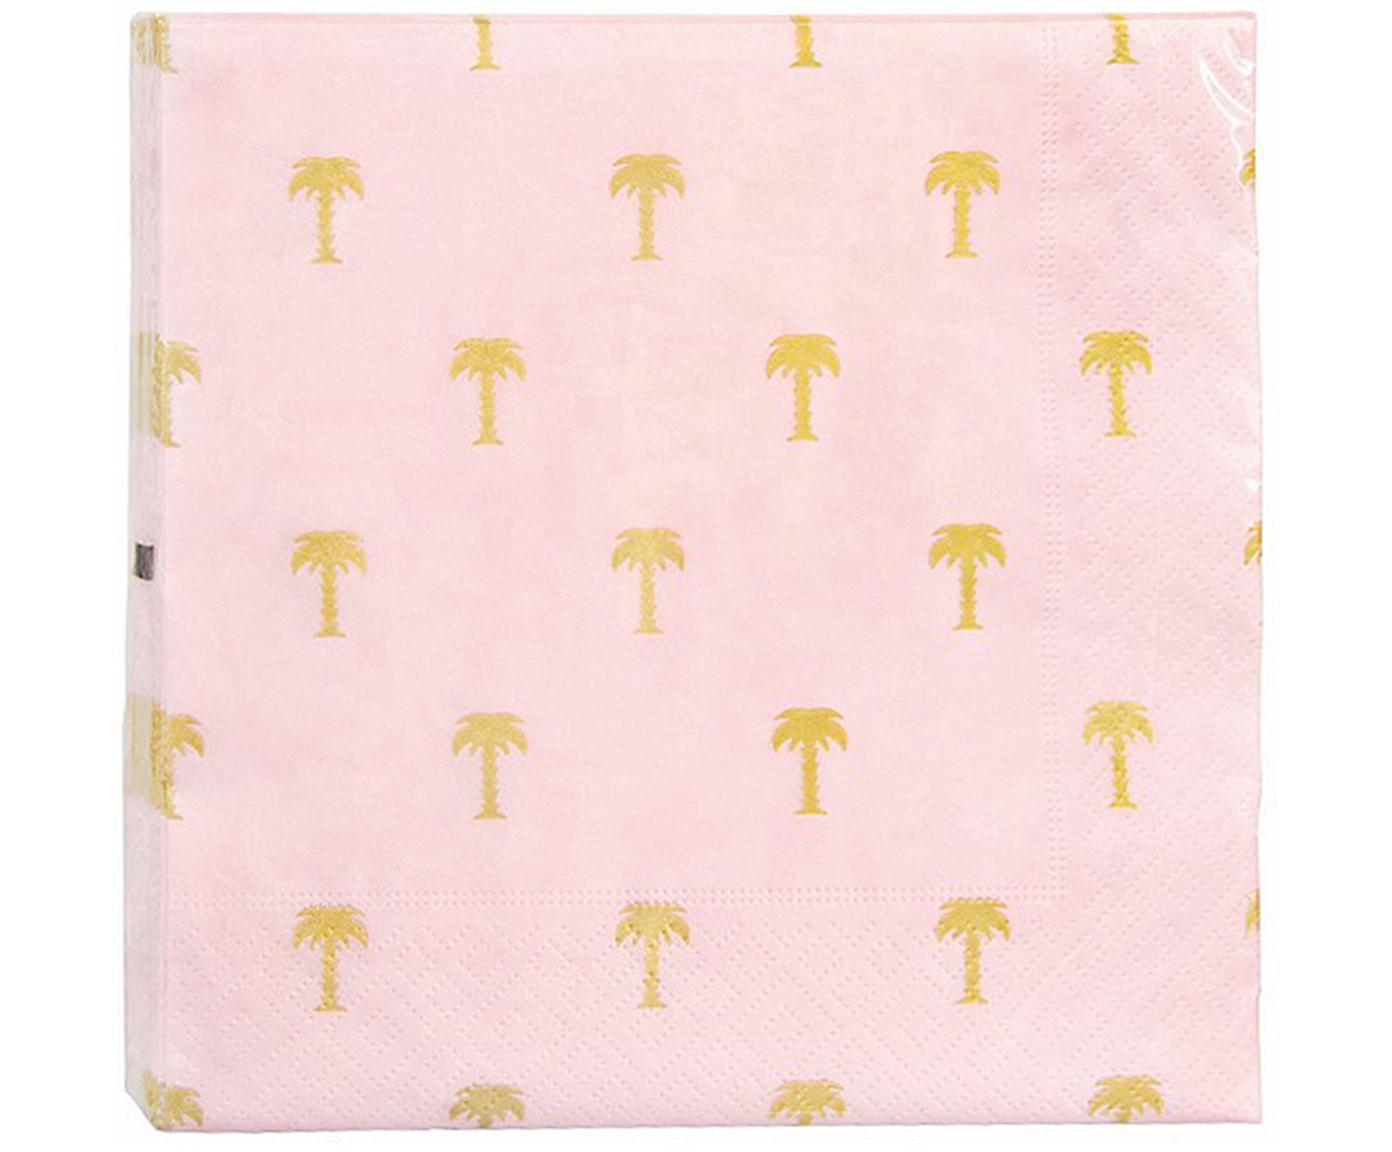 Papieren servetten Palmtree, 20 stuks, Papier, Roze, goudkleurig, 17 x 17 cm